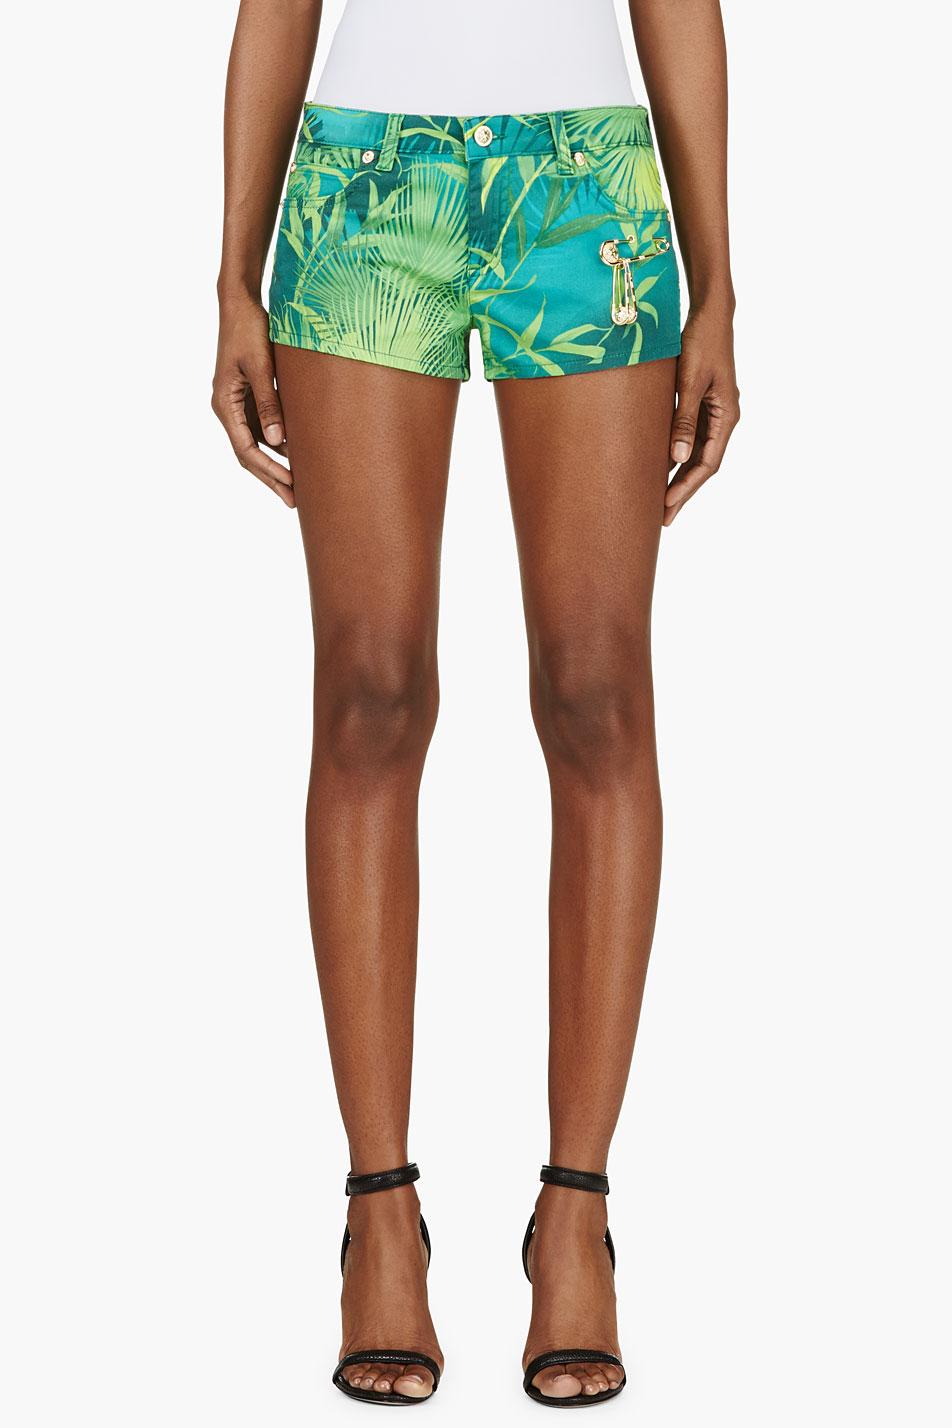 Versus green leaf print safety pin shorts